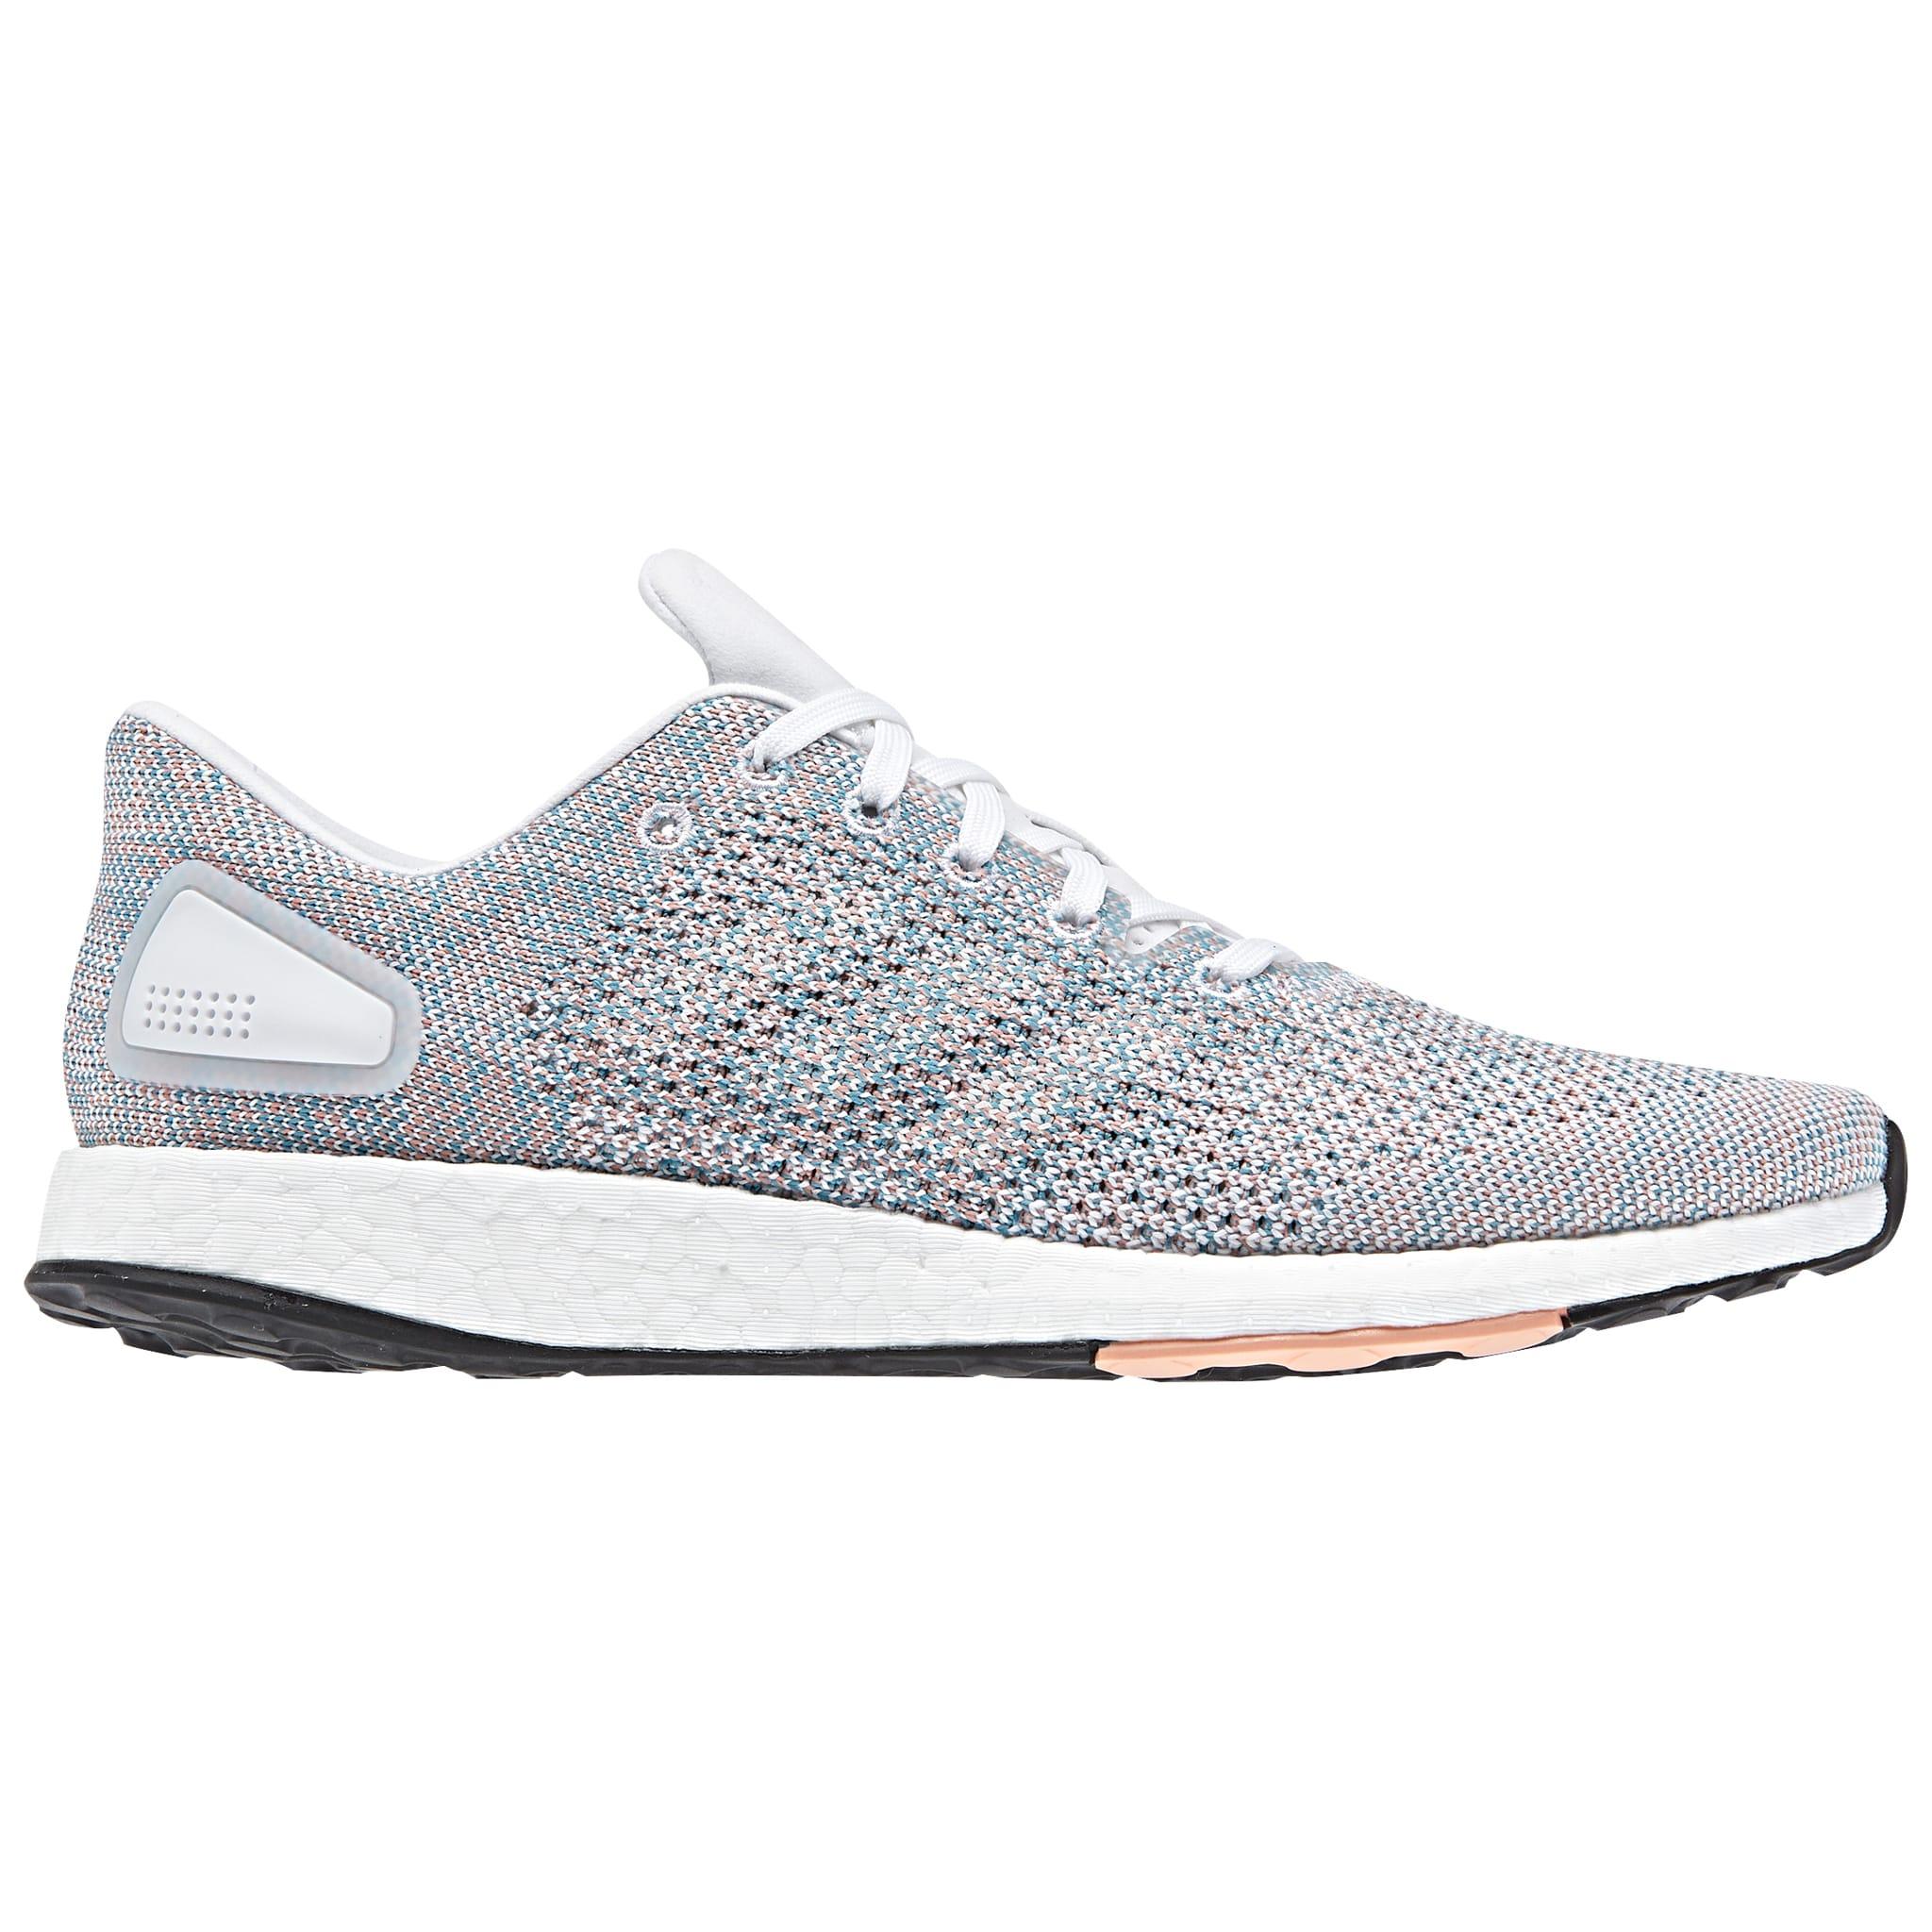 Minimalistiske sko for løping i byen